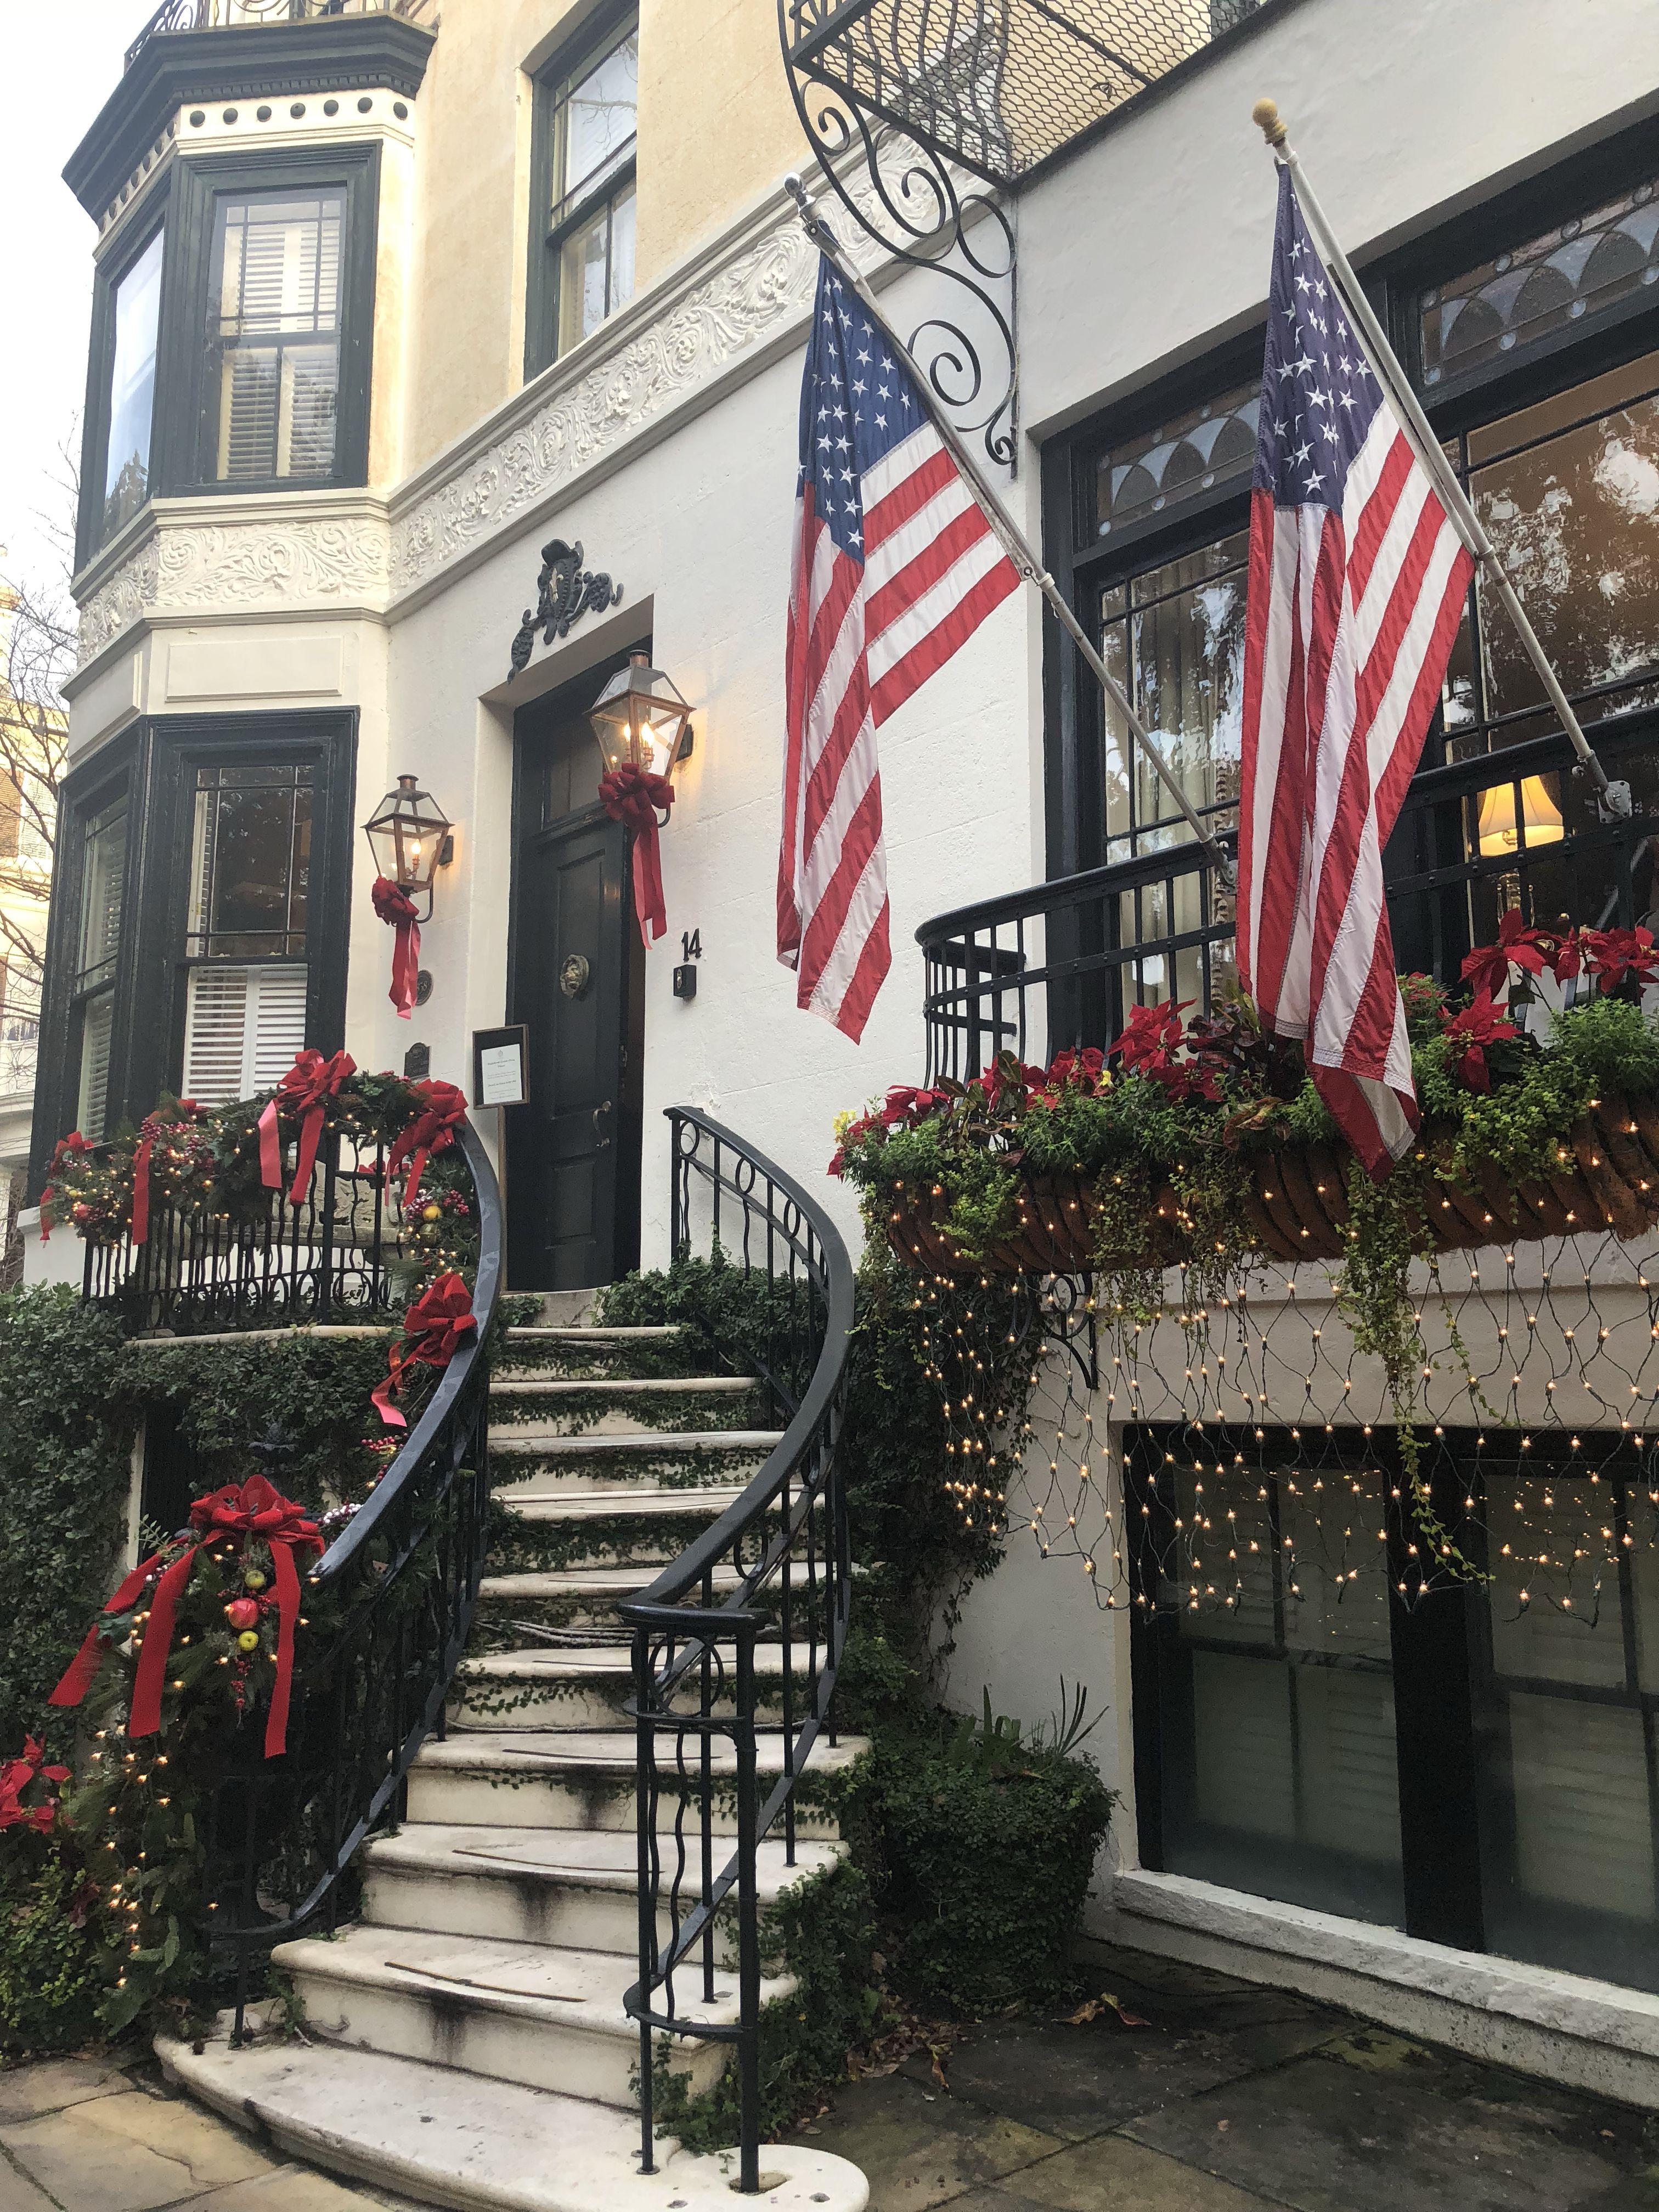 Christmas In Savannah Georgia 2019.Best Place To Stay In Savannah Georgia Ballastone Inn